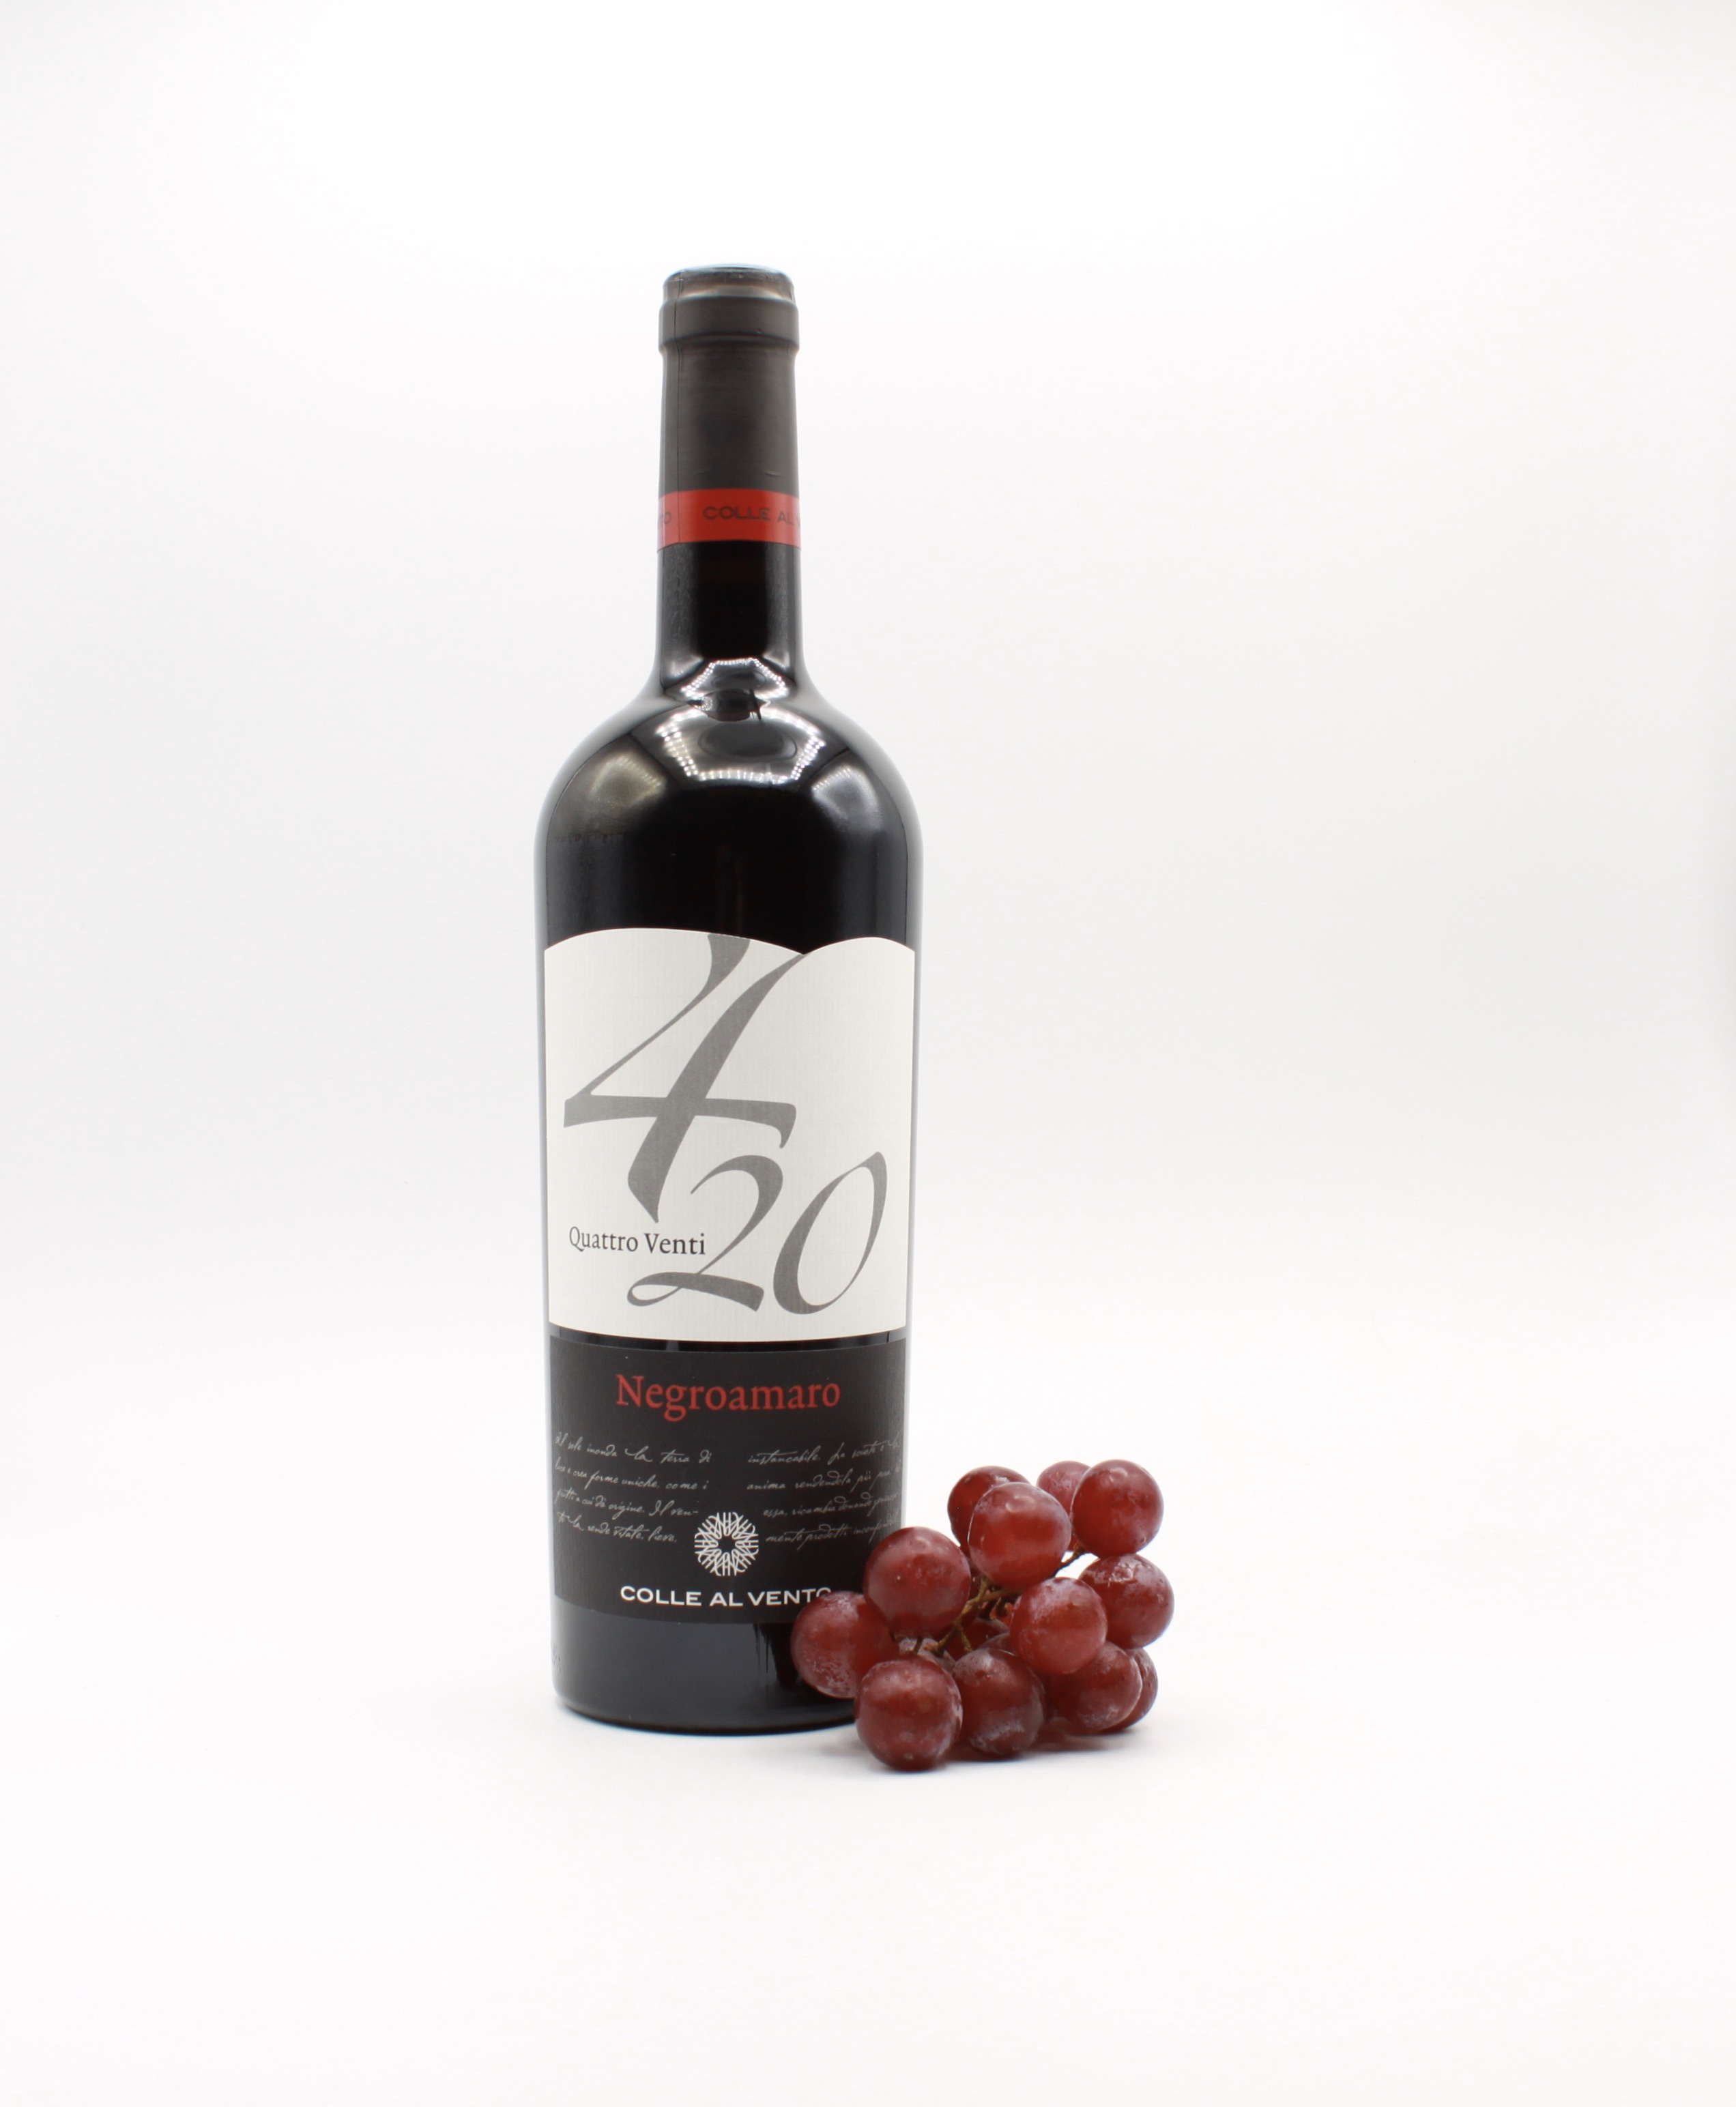 Negroamaro Salento IGP 4/20 - Colle al Vento, Italienischer Rotwein